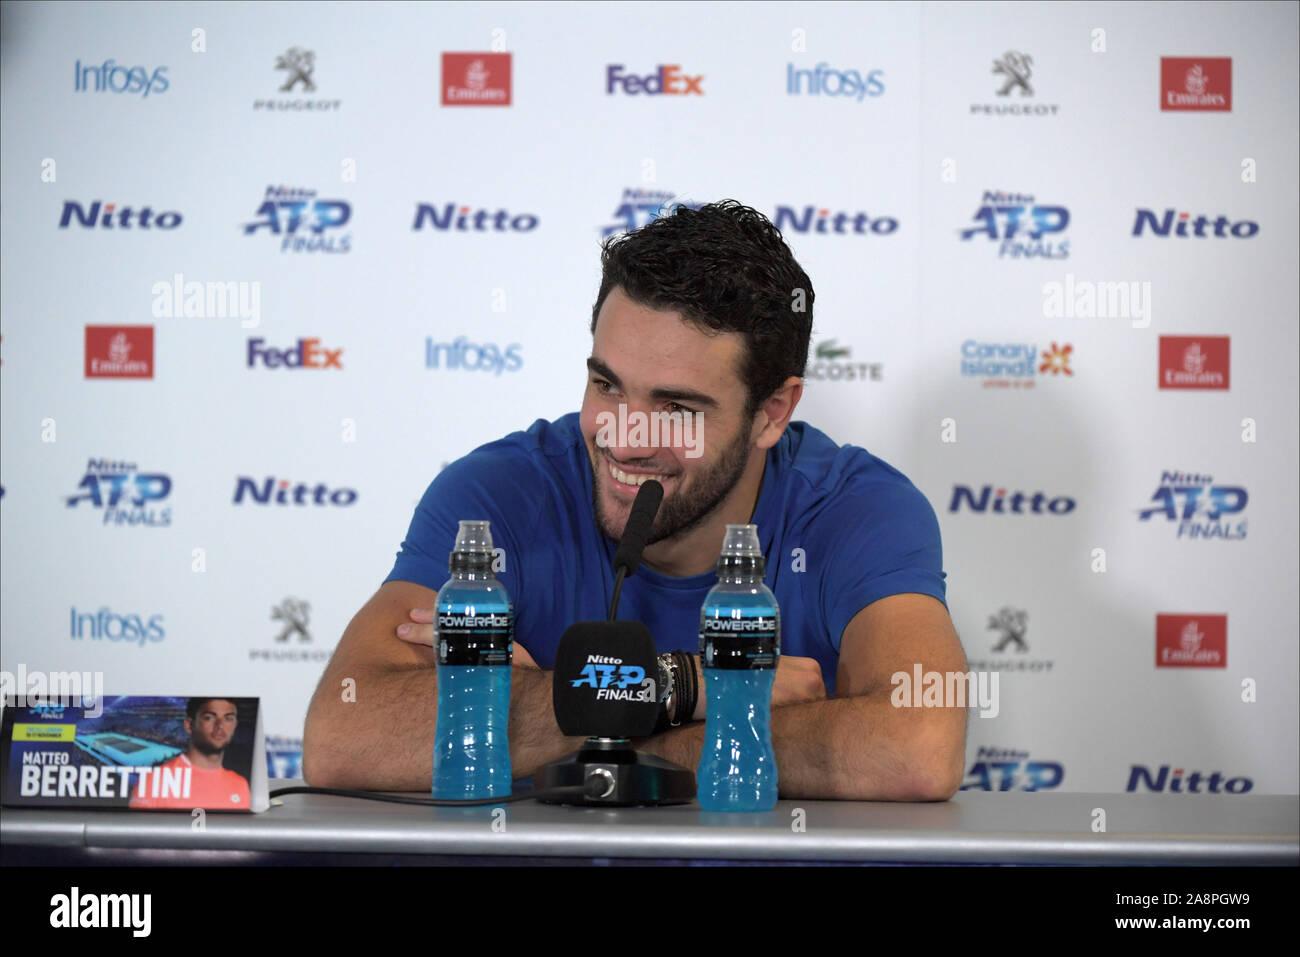 London, Italy. 10th Nov, 2019. berettini during Nitto ATP Finals - Tennis Internationals - Credit: LPS/Roberto Zanettin/Alamy Live News Stock Photo